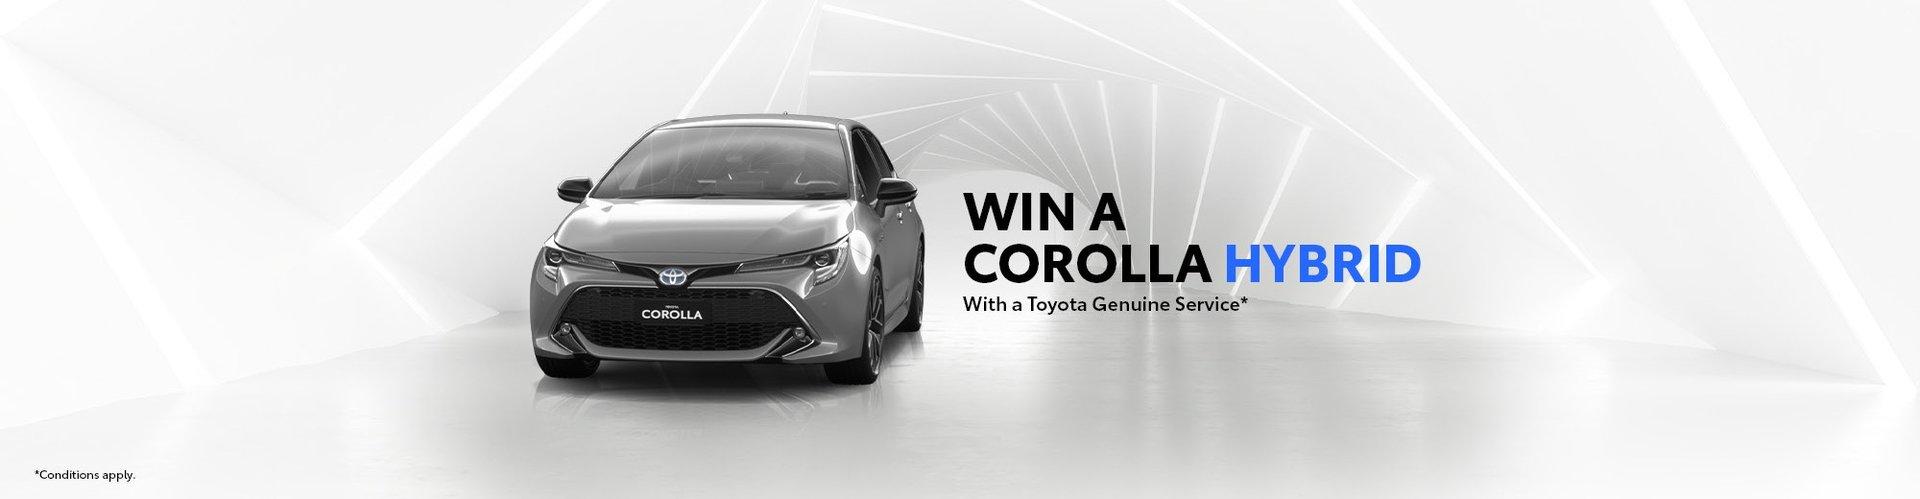 Win a Corolla Hybrid